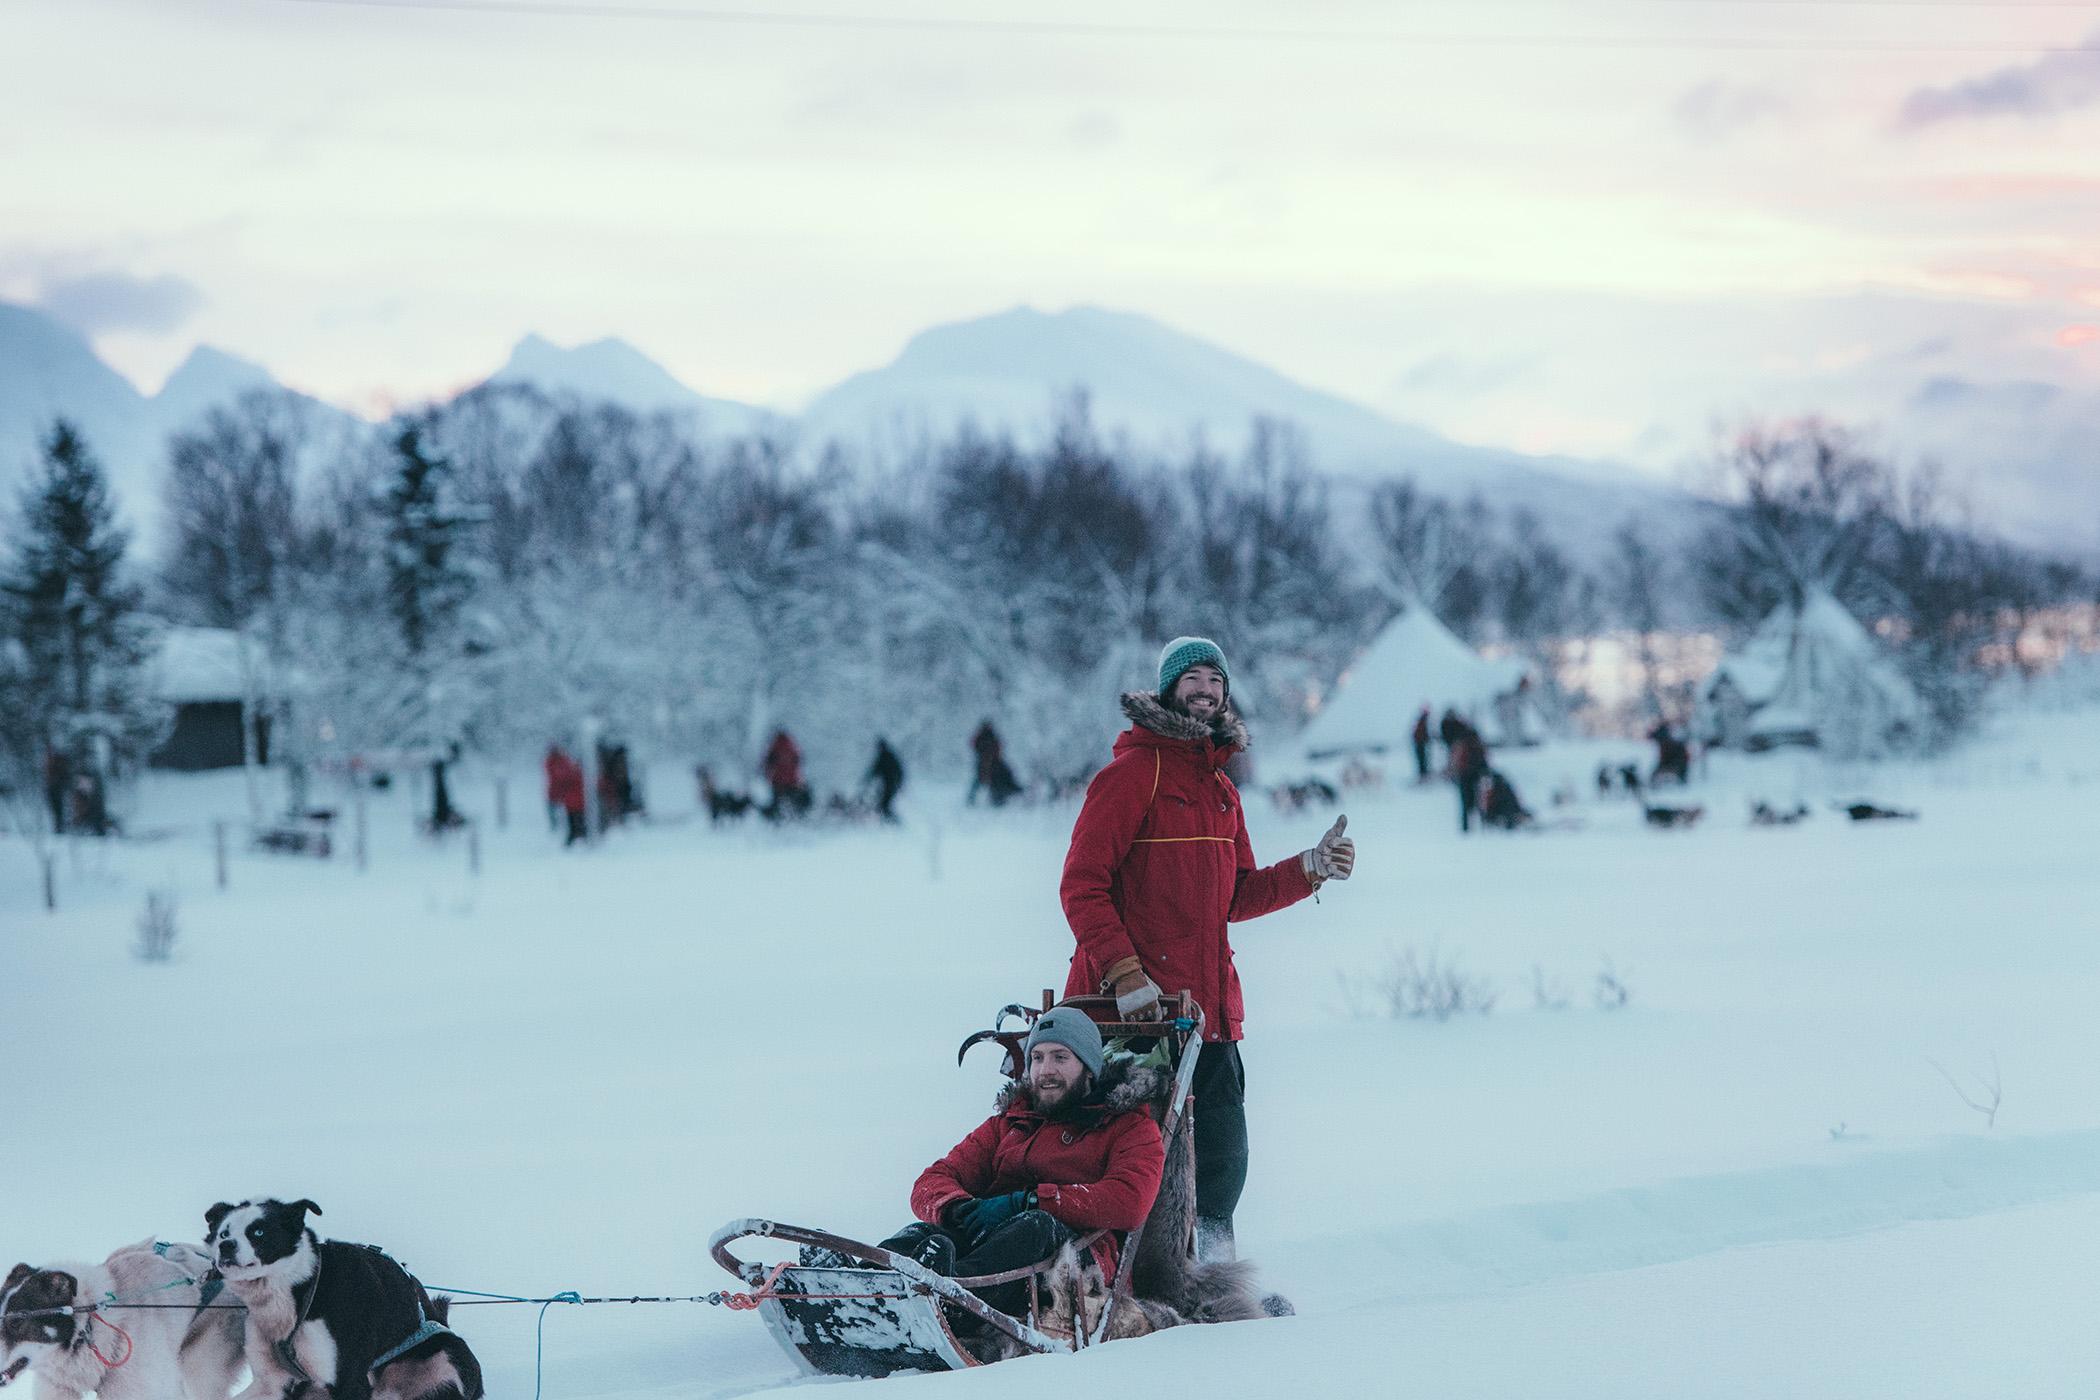 Our team, Arctic Adventure Tours